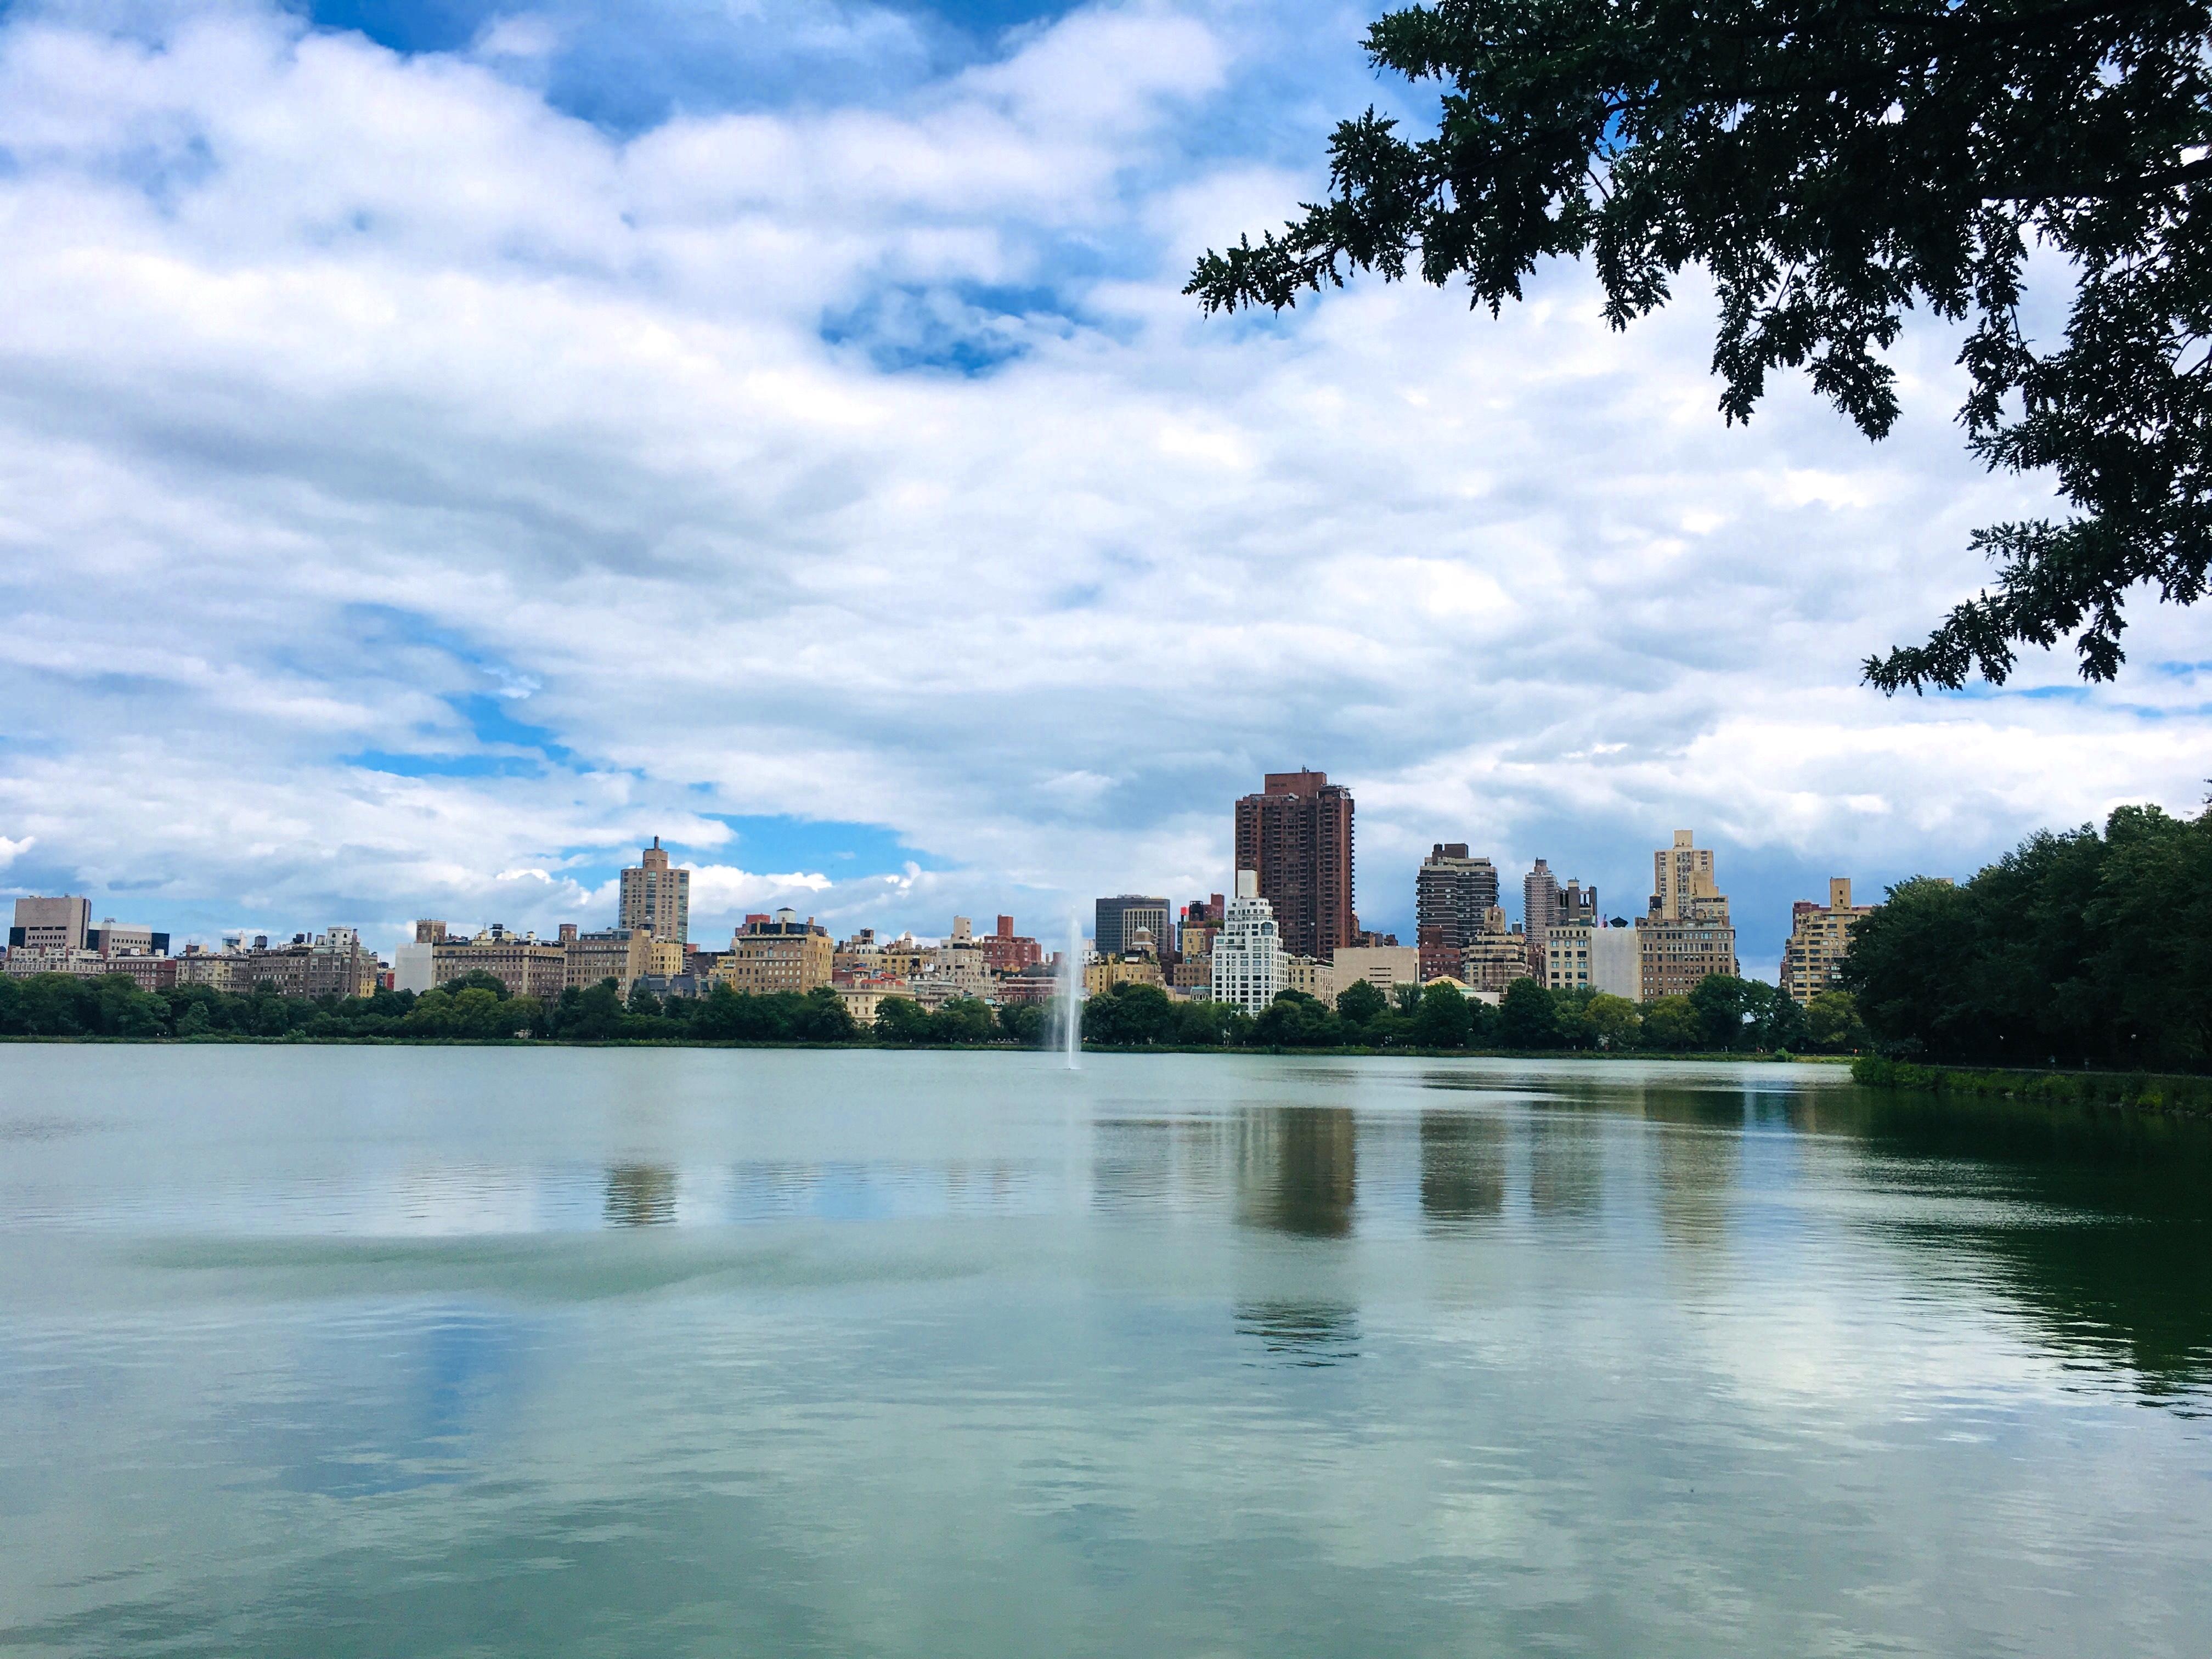 Hardlopen in Central Park